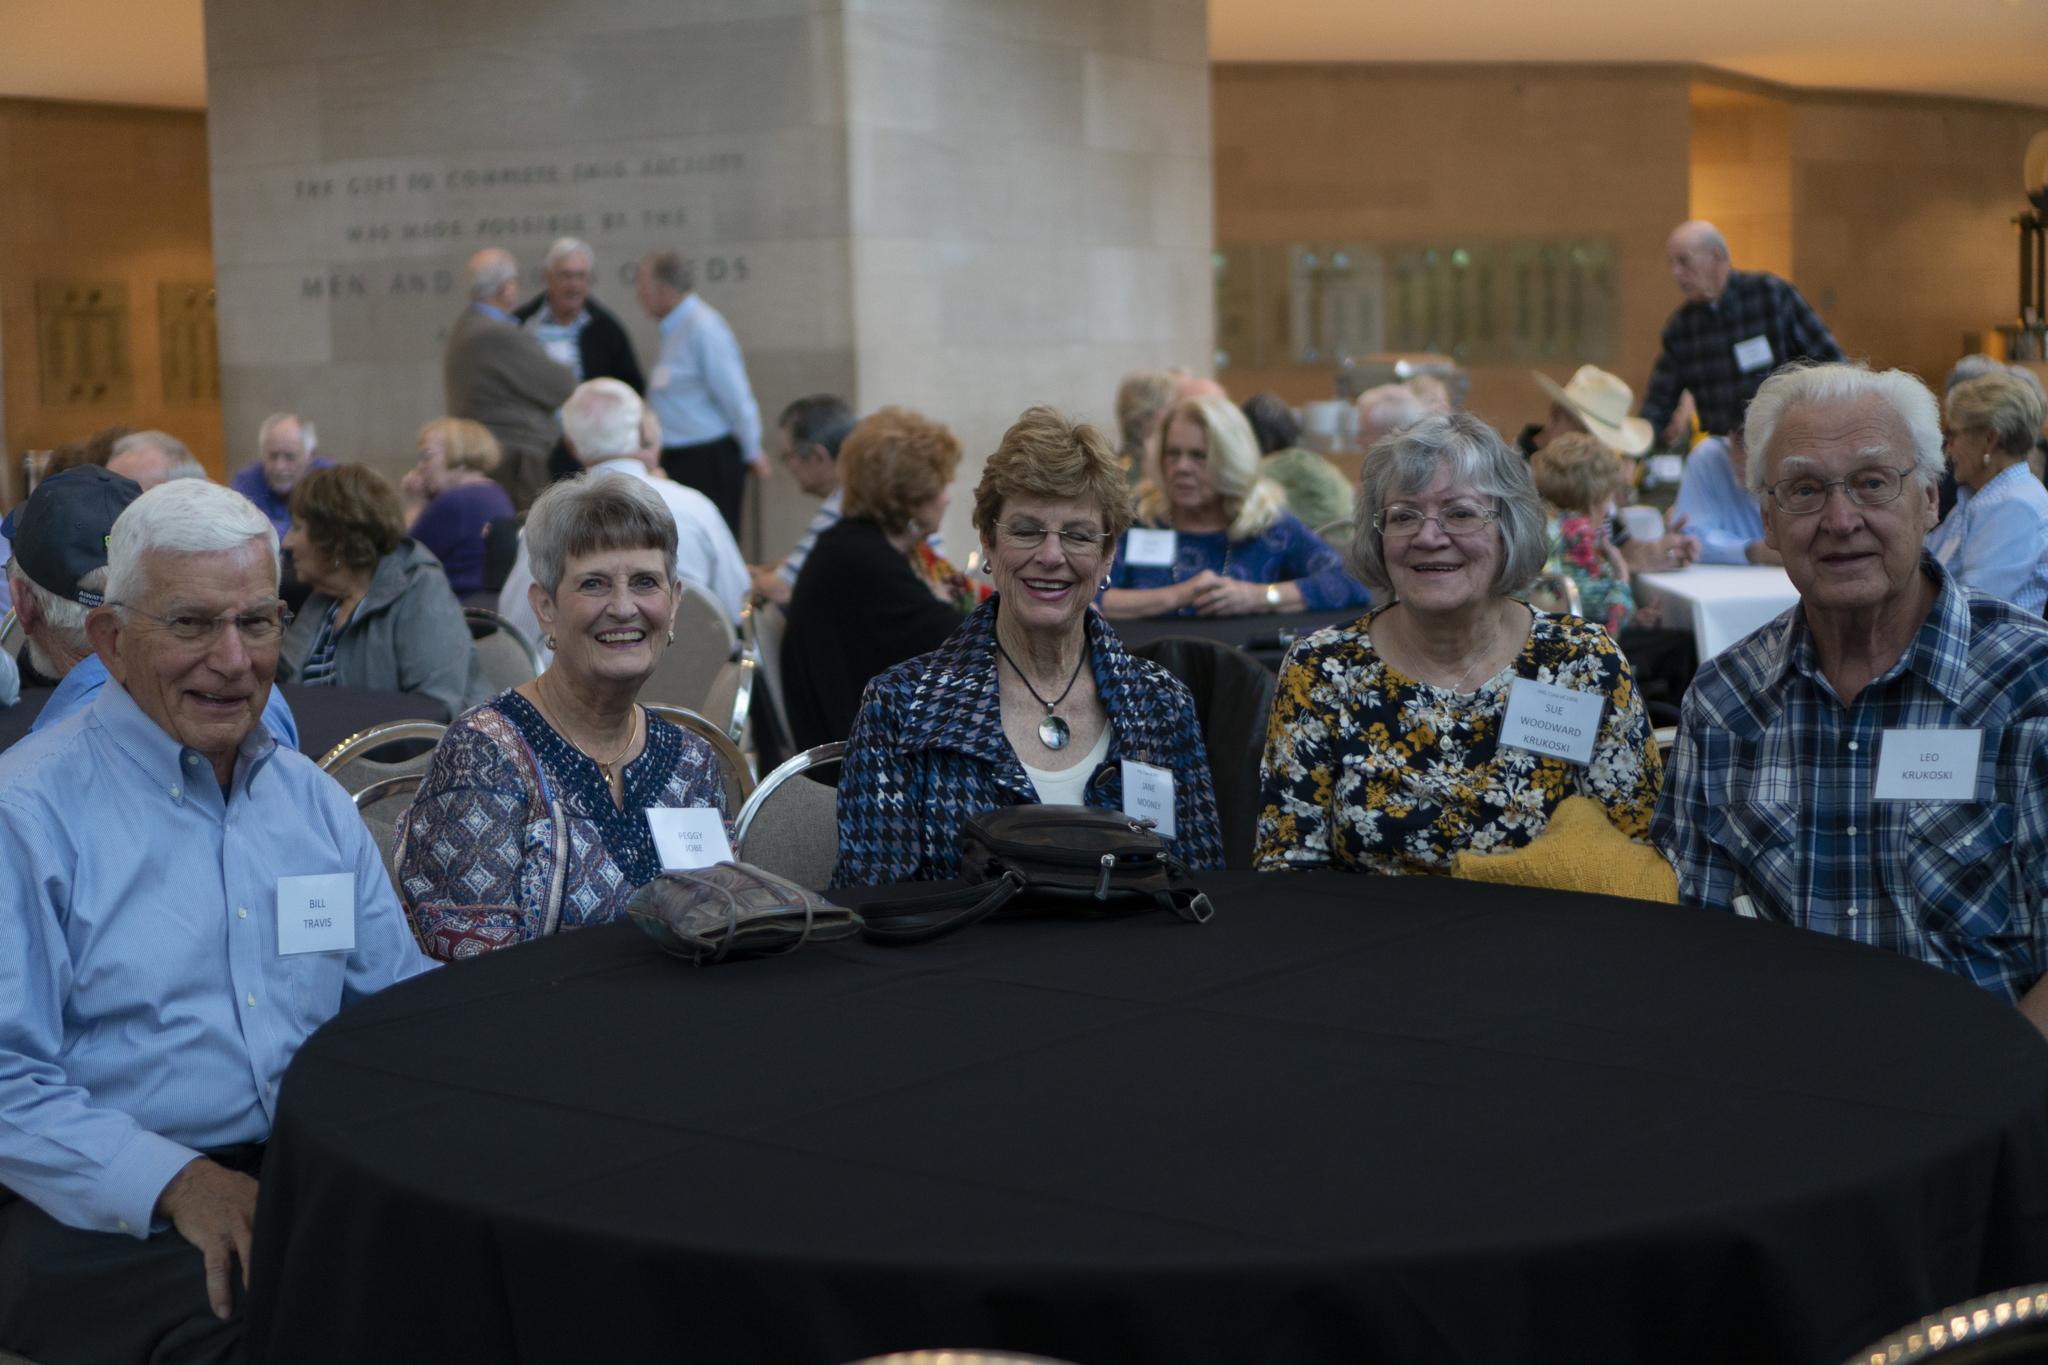 Bill Travis, Peggy Jobe, Jane Mooney Travis, Sue Woodward Krukoski and Leo Krukoski